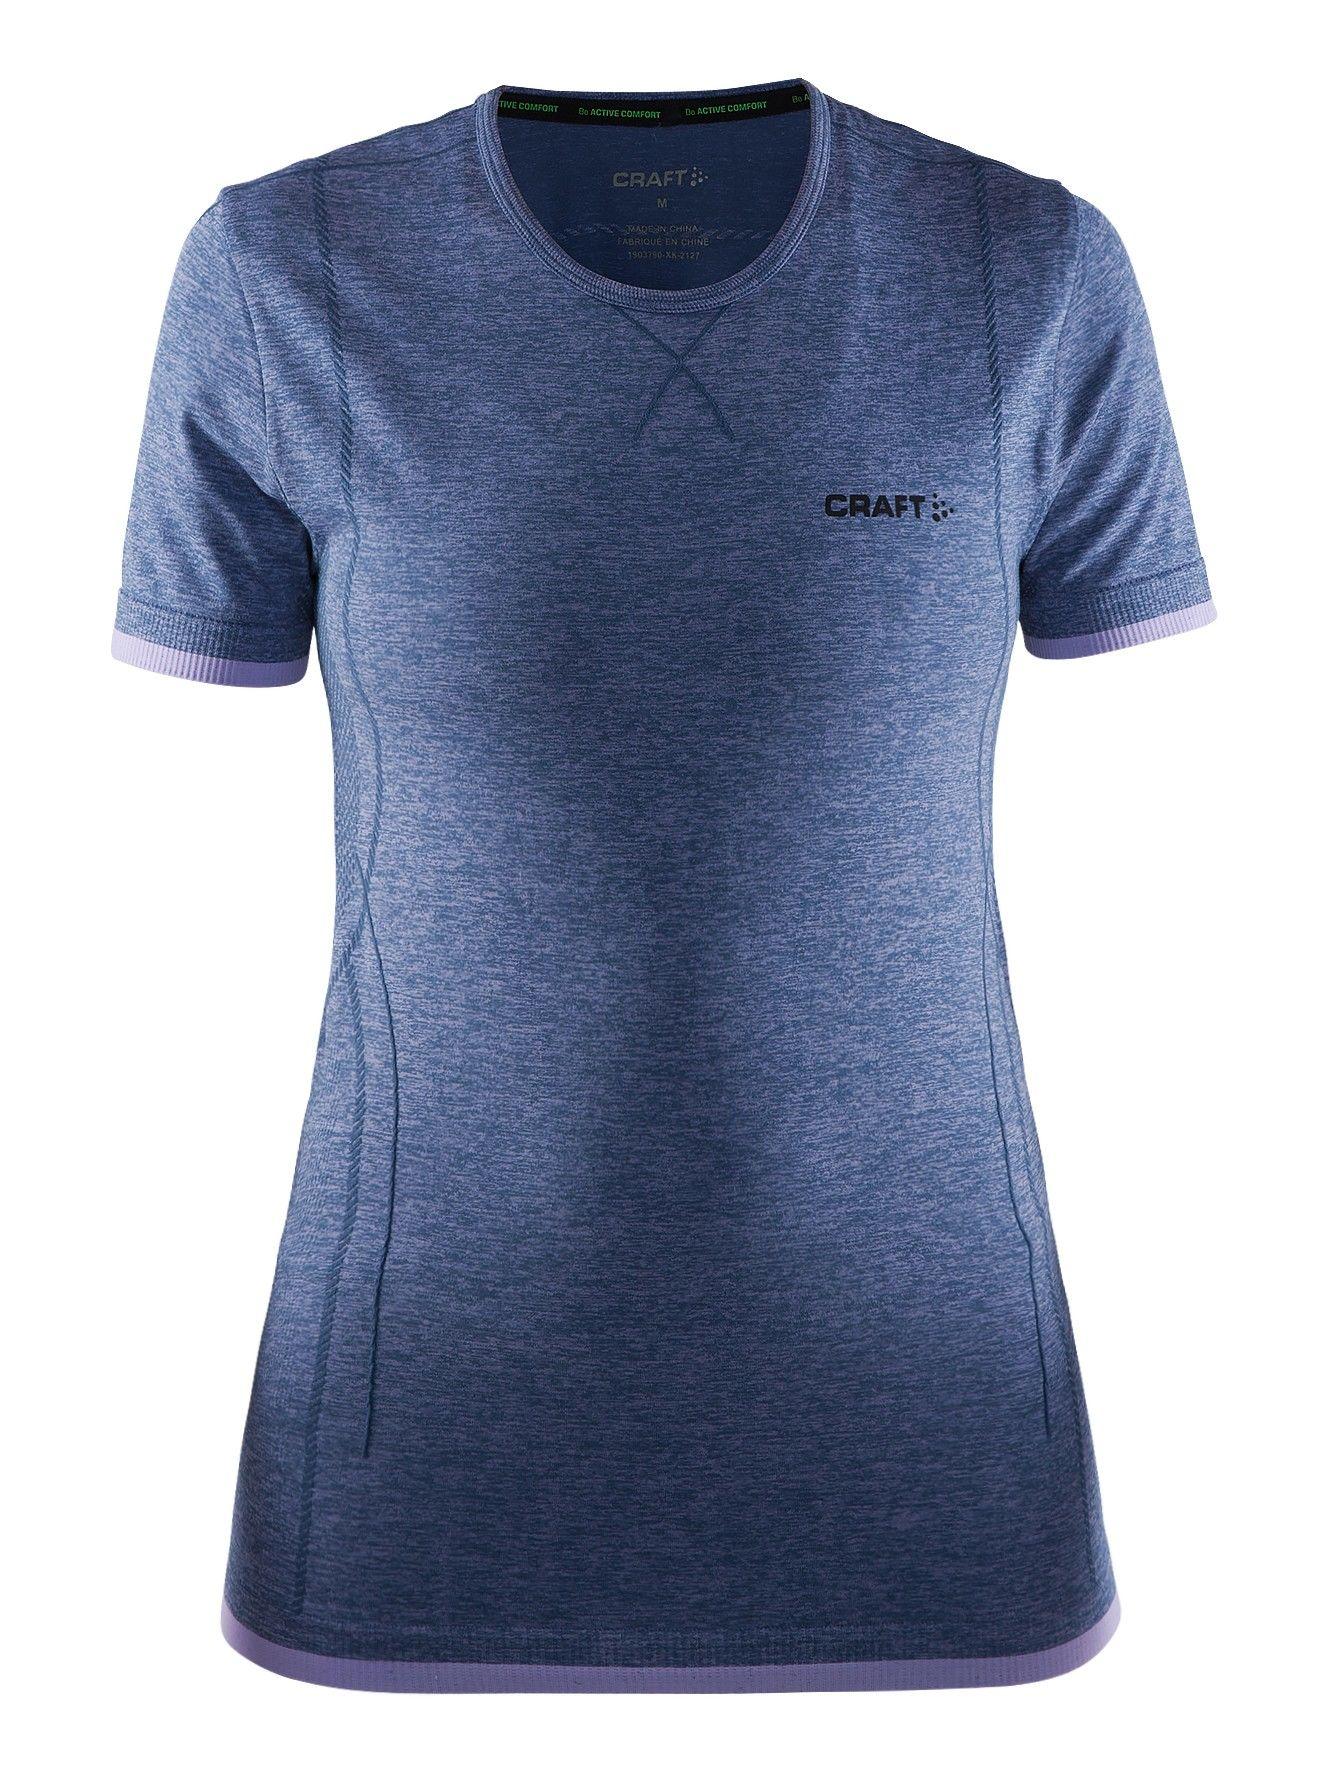 Craft W Active Comfort RN Short-Sleeve | Größe XS,S,M,L,XL | Damen Kurzarm-Shi